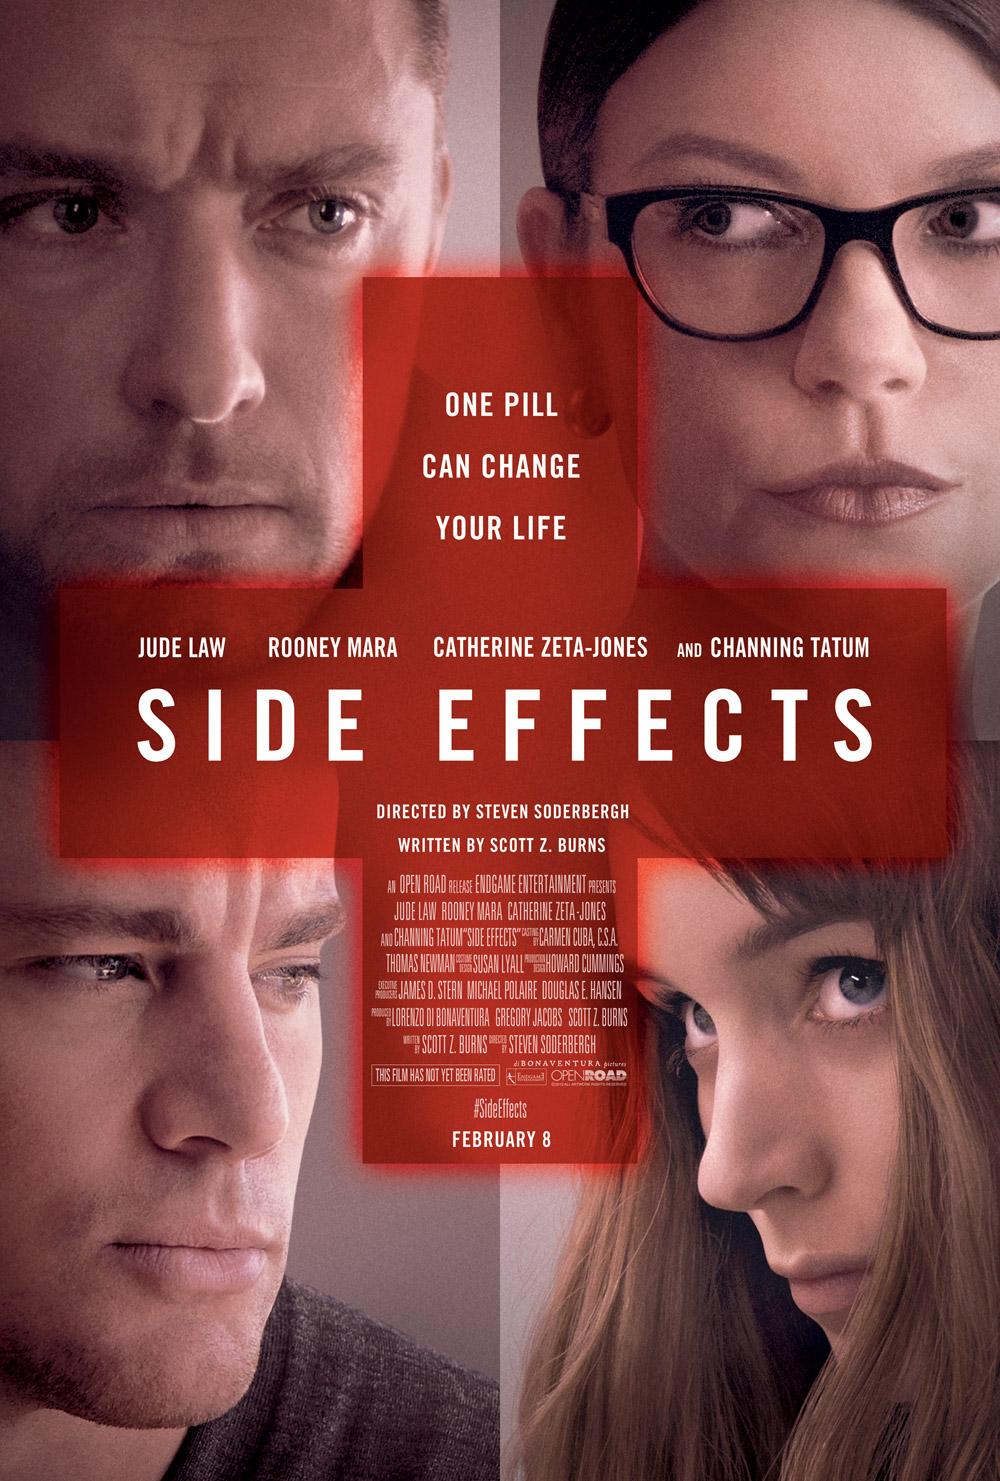 SideEffects-exclusive-lg.jpg